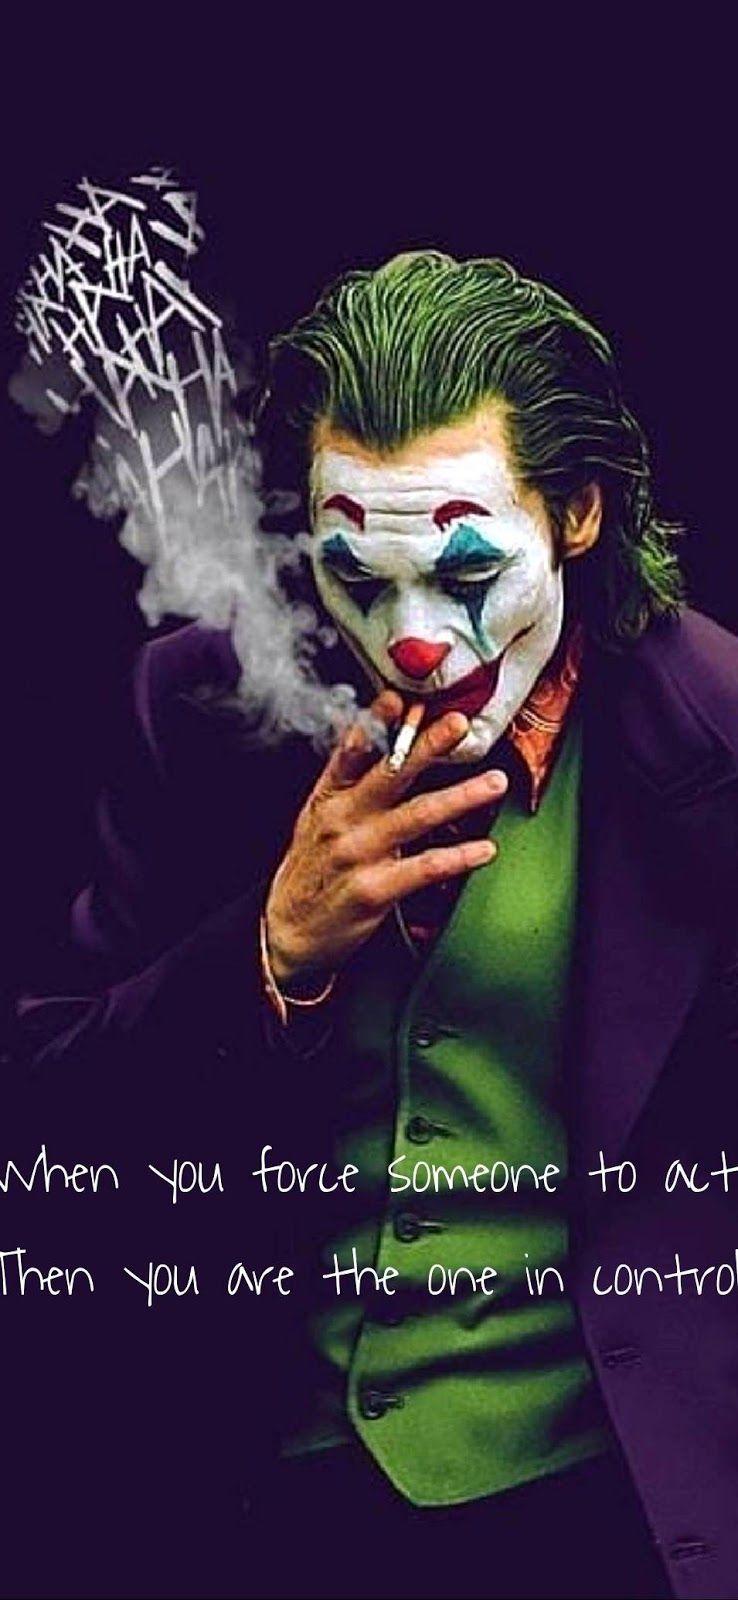 Jocker Full Hd Images For Mobile And Pc Background Joker Images Download Joker Cartoon Images Joker Quot In 2020 Joker Wallpapers Joker Hd Wallpaper Joker Images